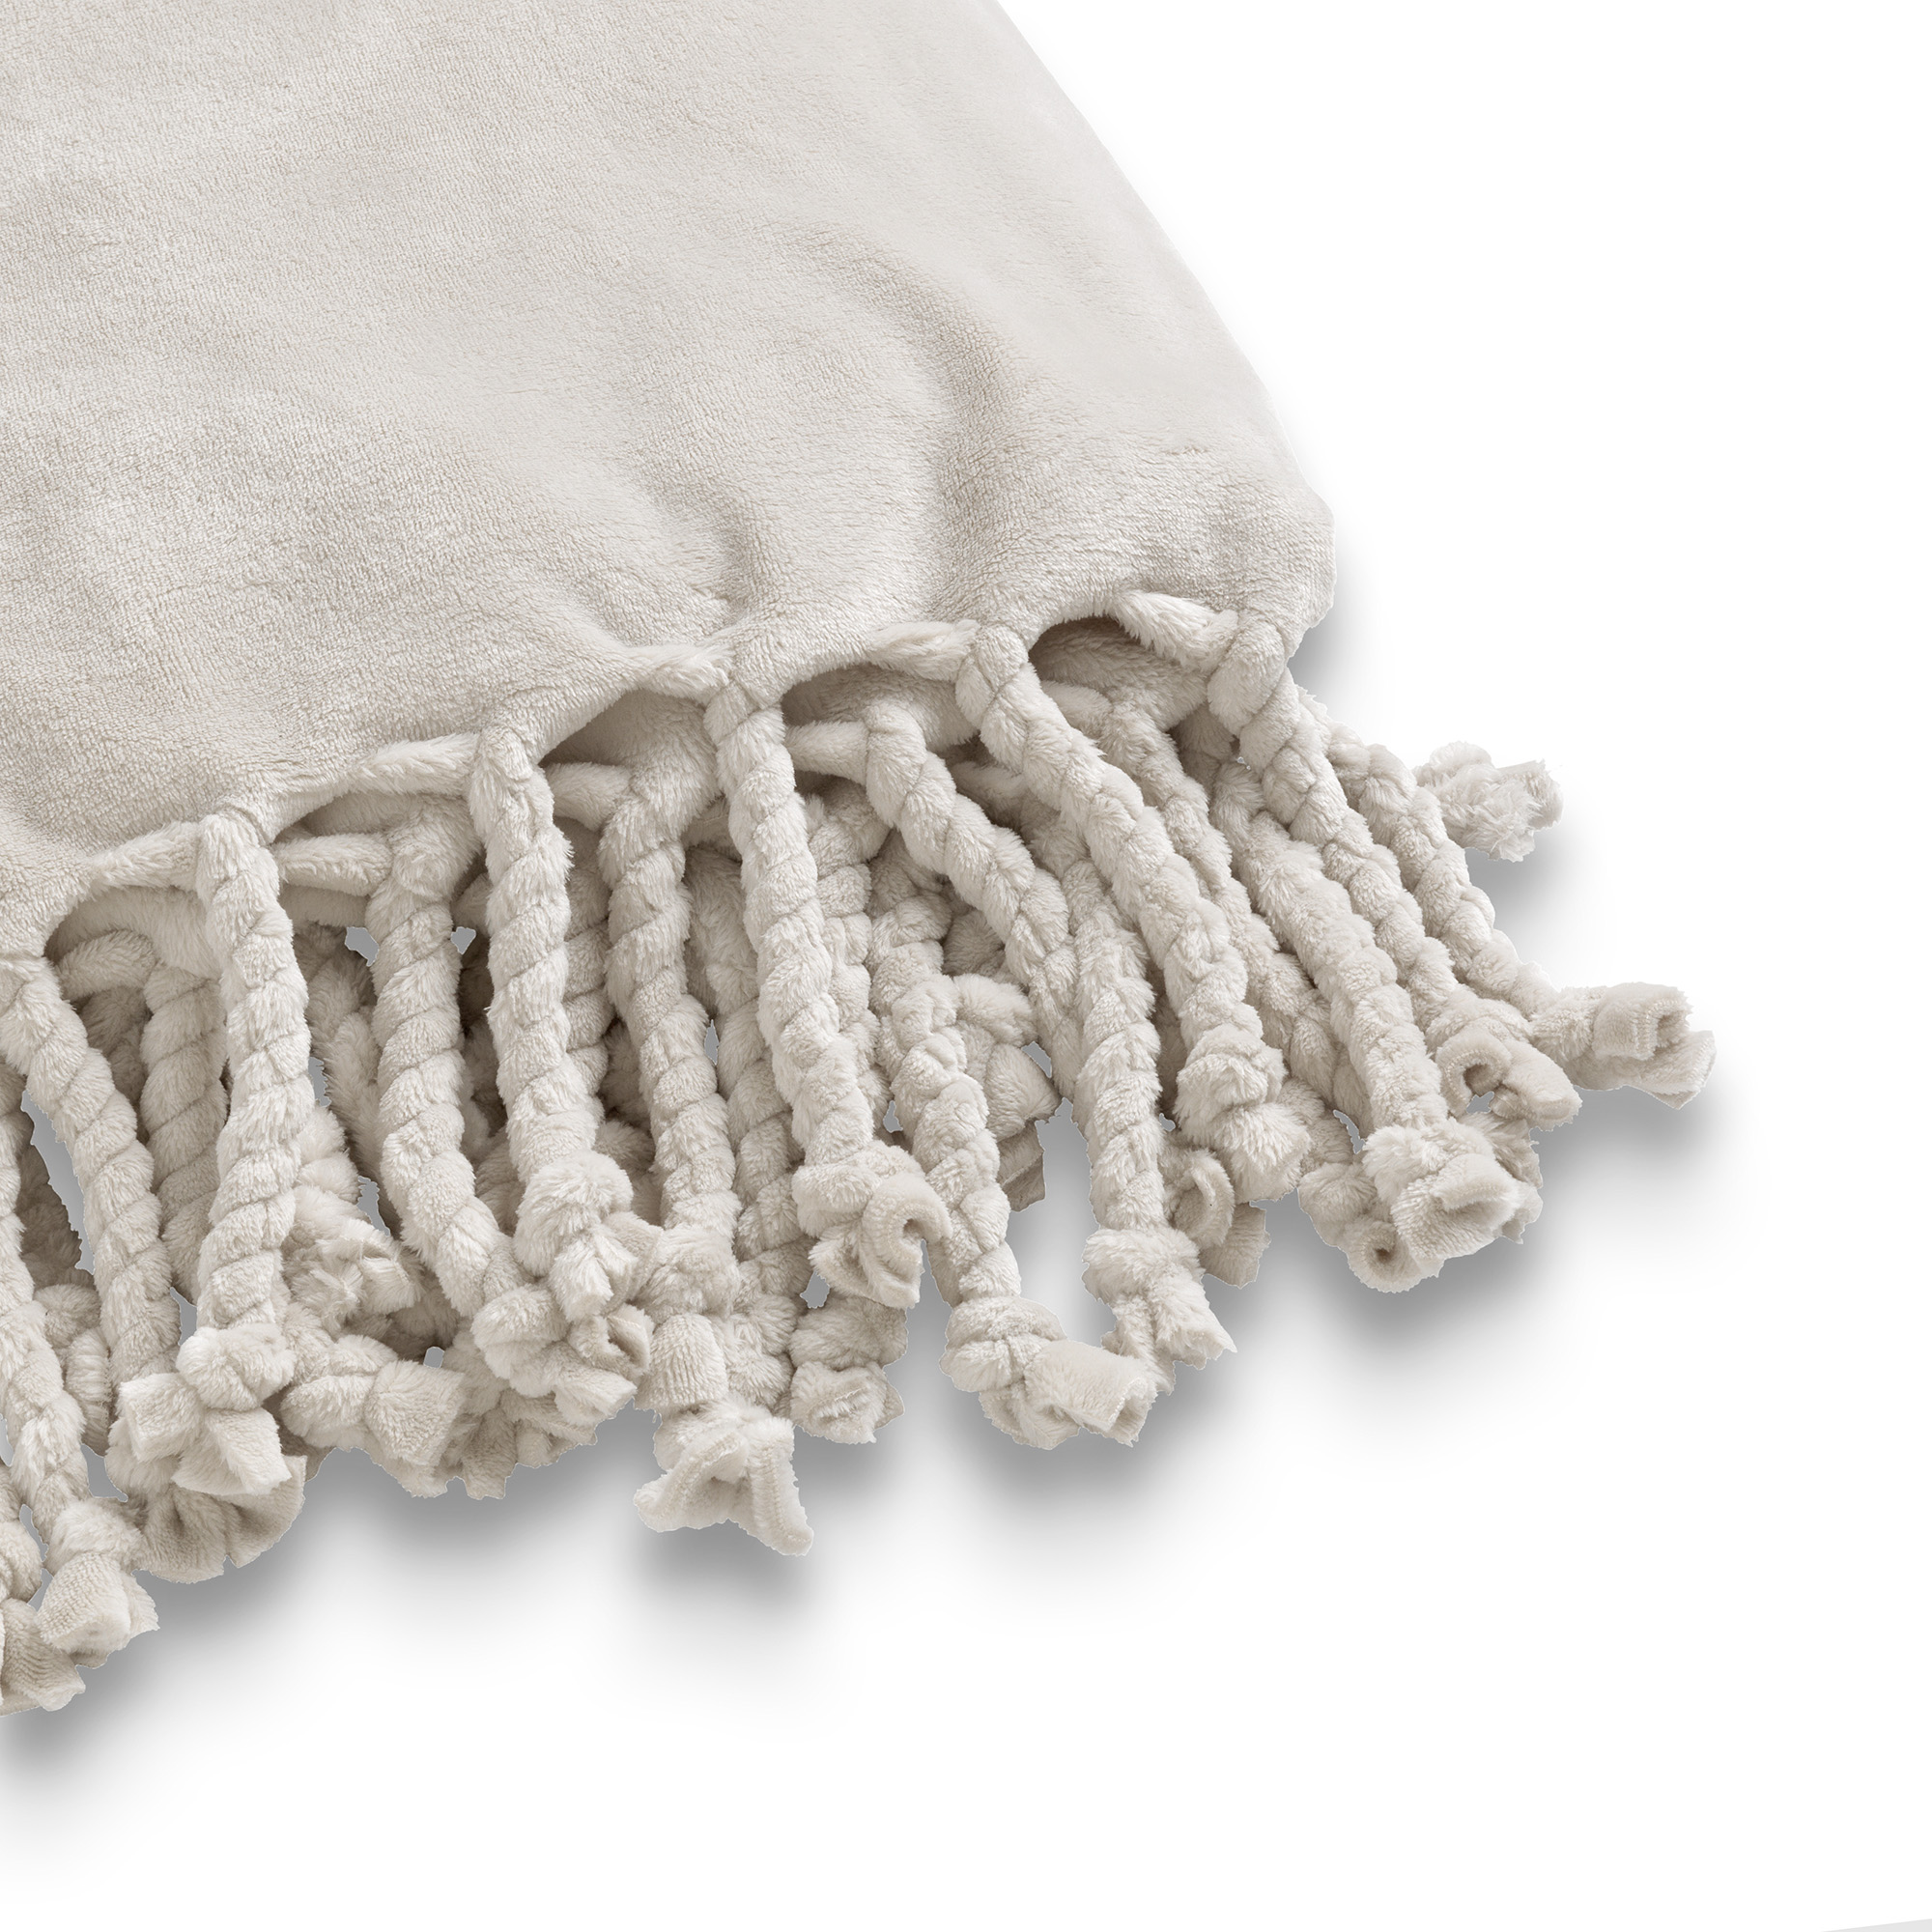 FLORIJN - Plaid van fleece 150x200 cm Snow White